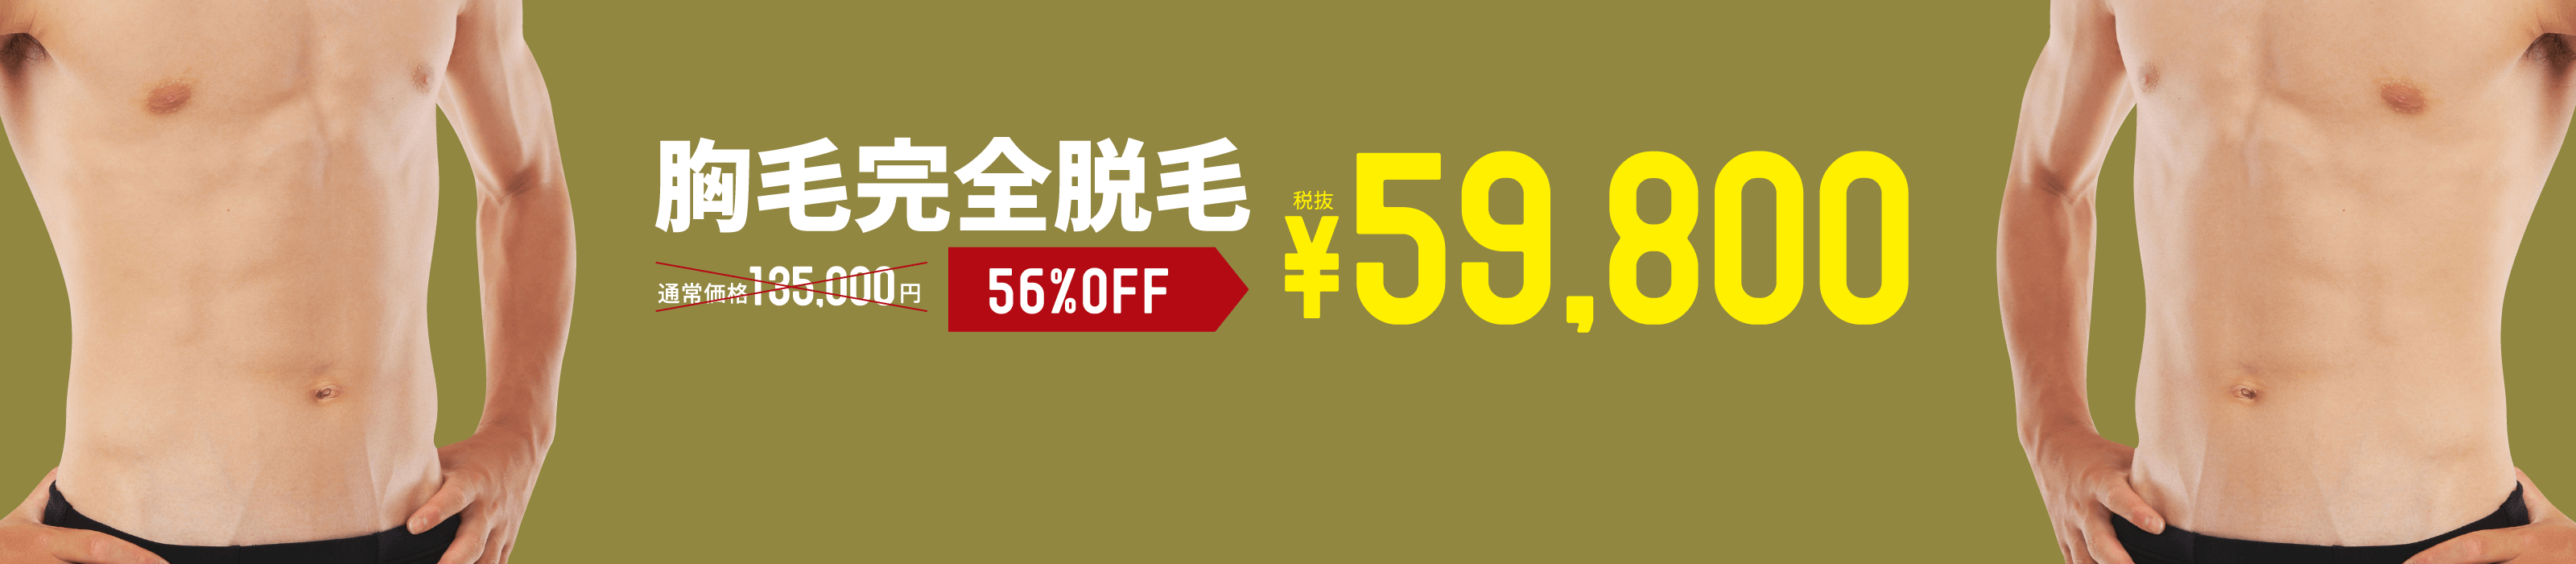 胸毛完全脱毛 税抜き¥59,800